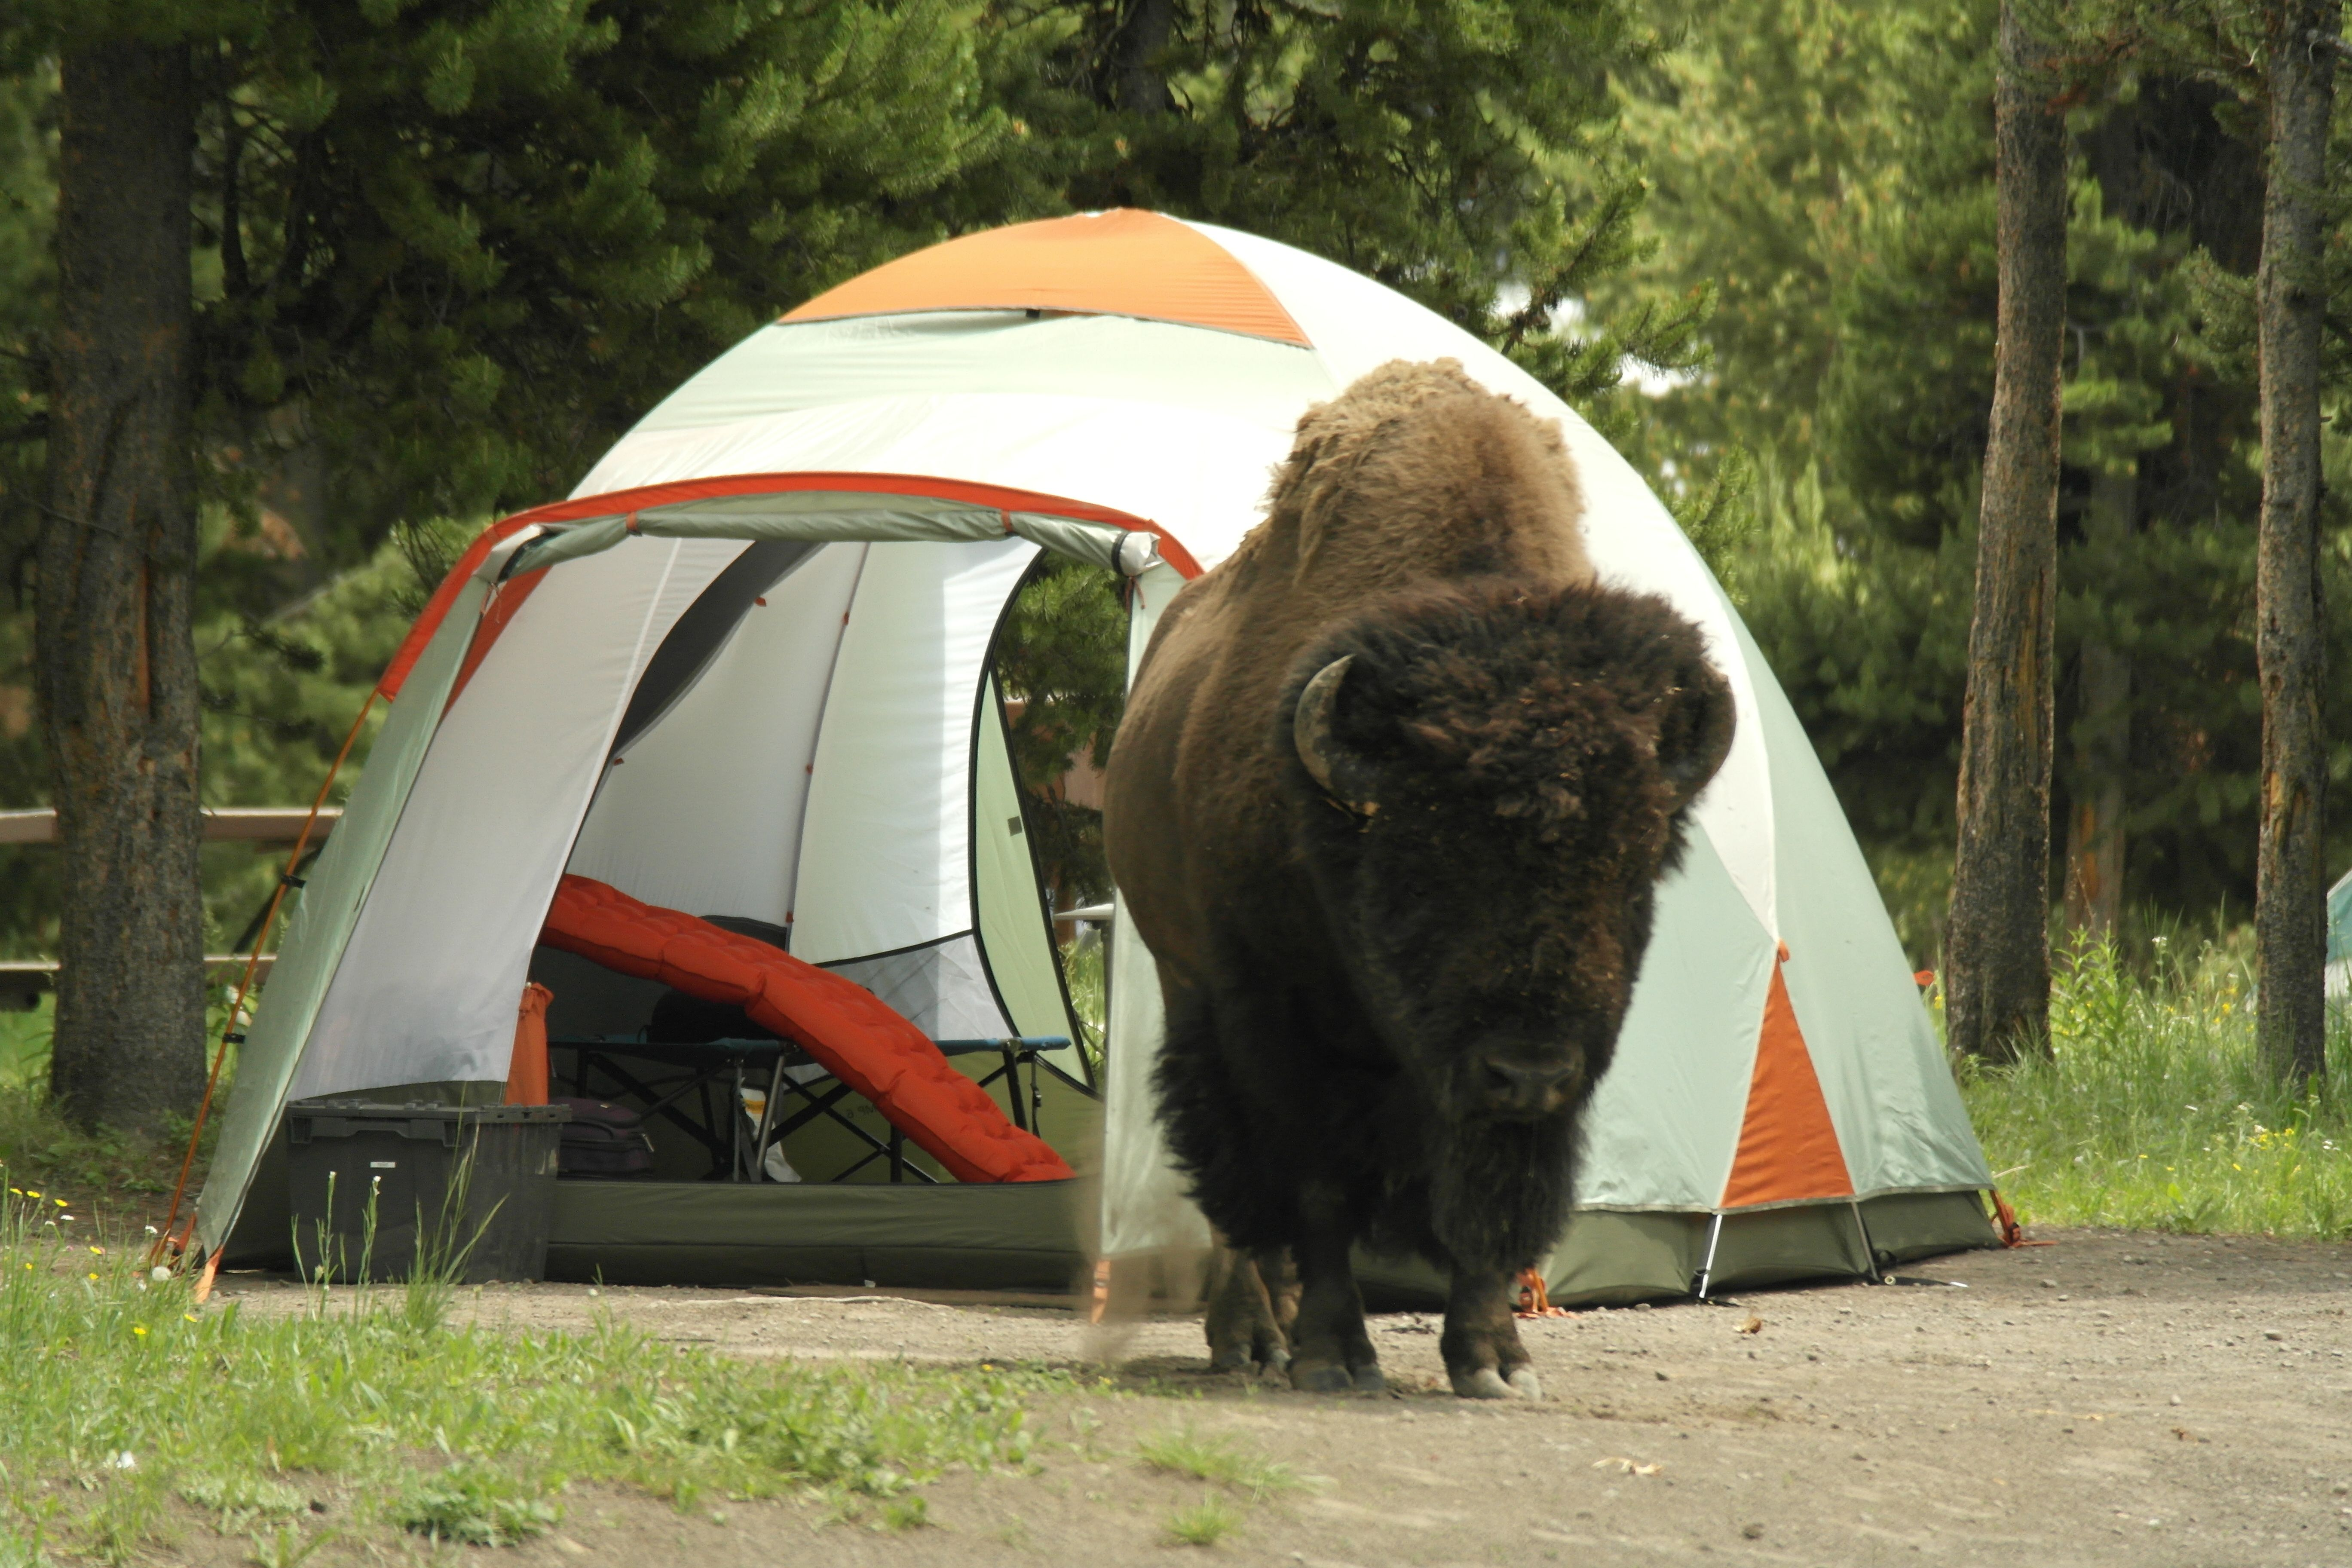 base camp 6 rei tent Google Search